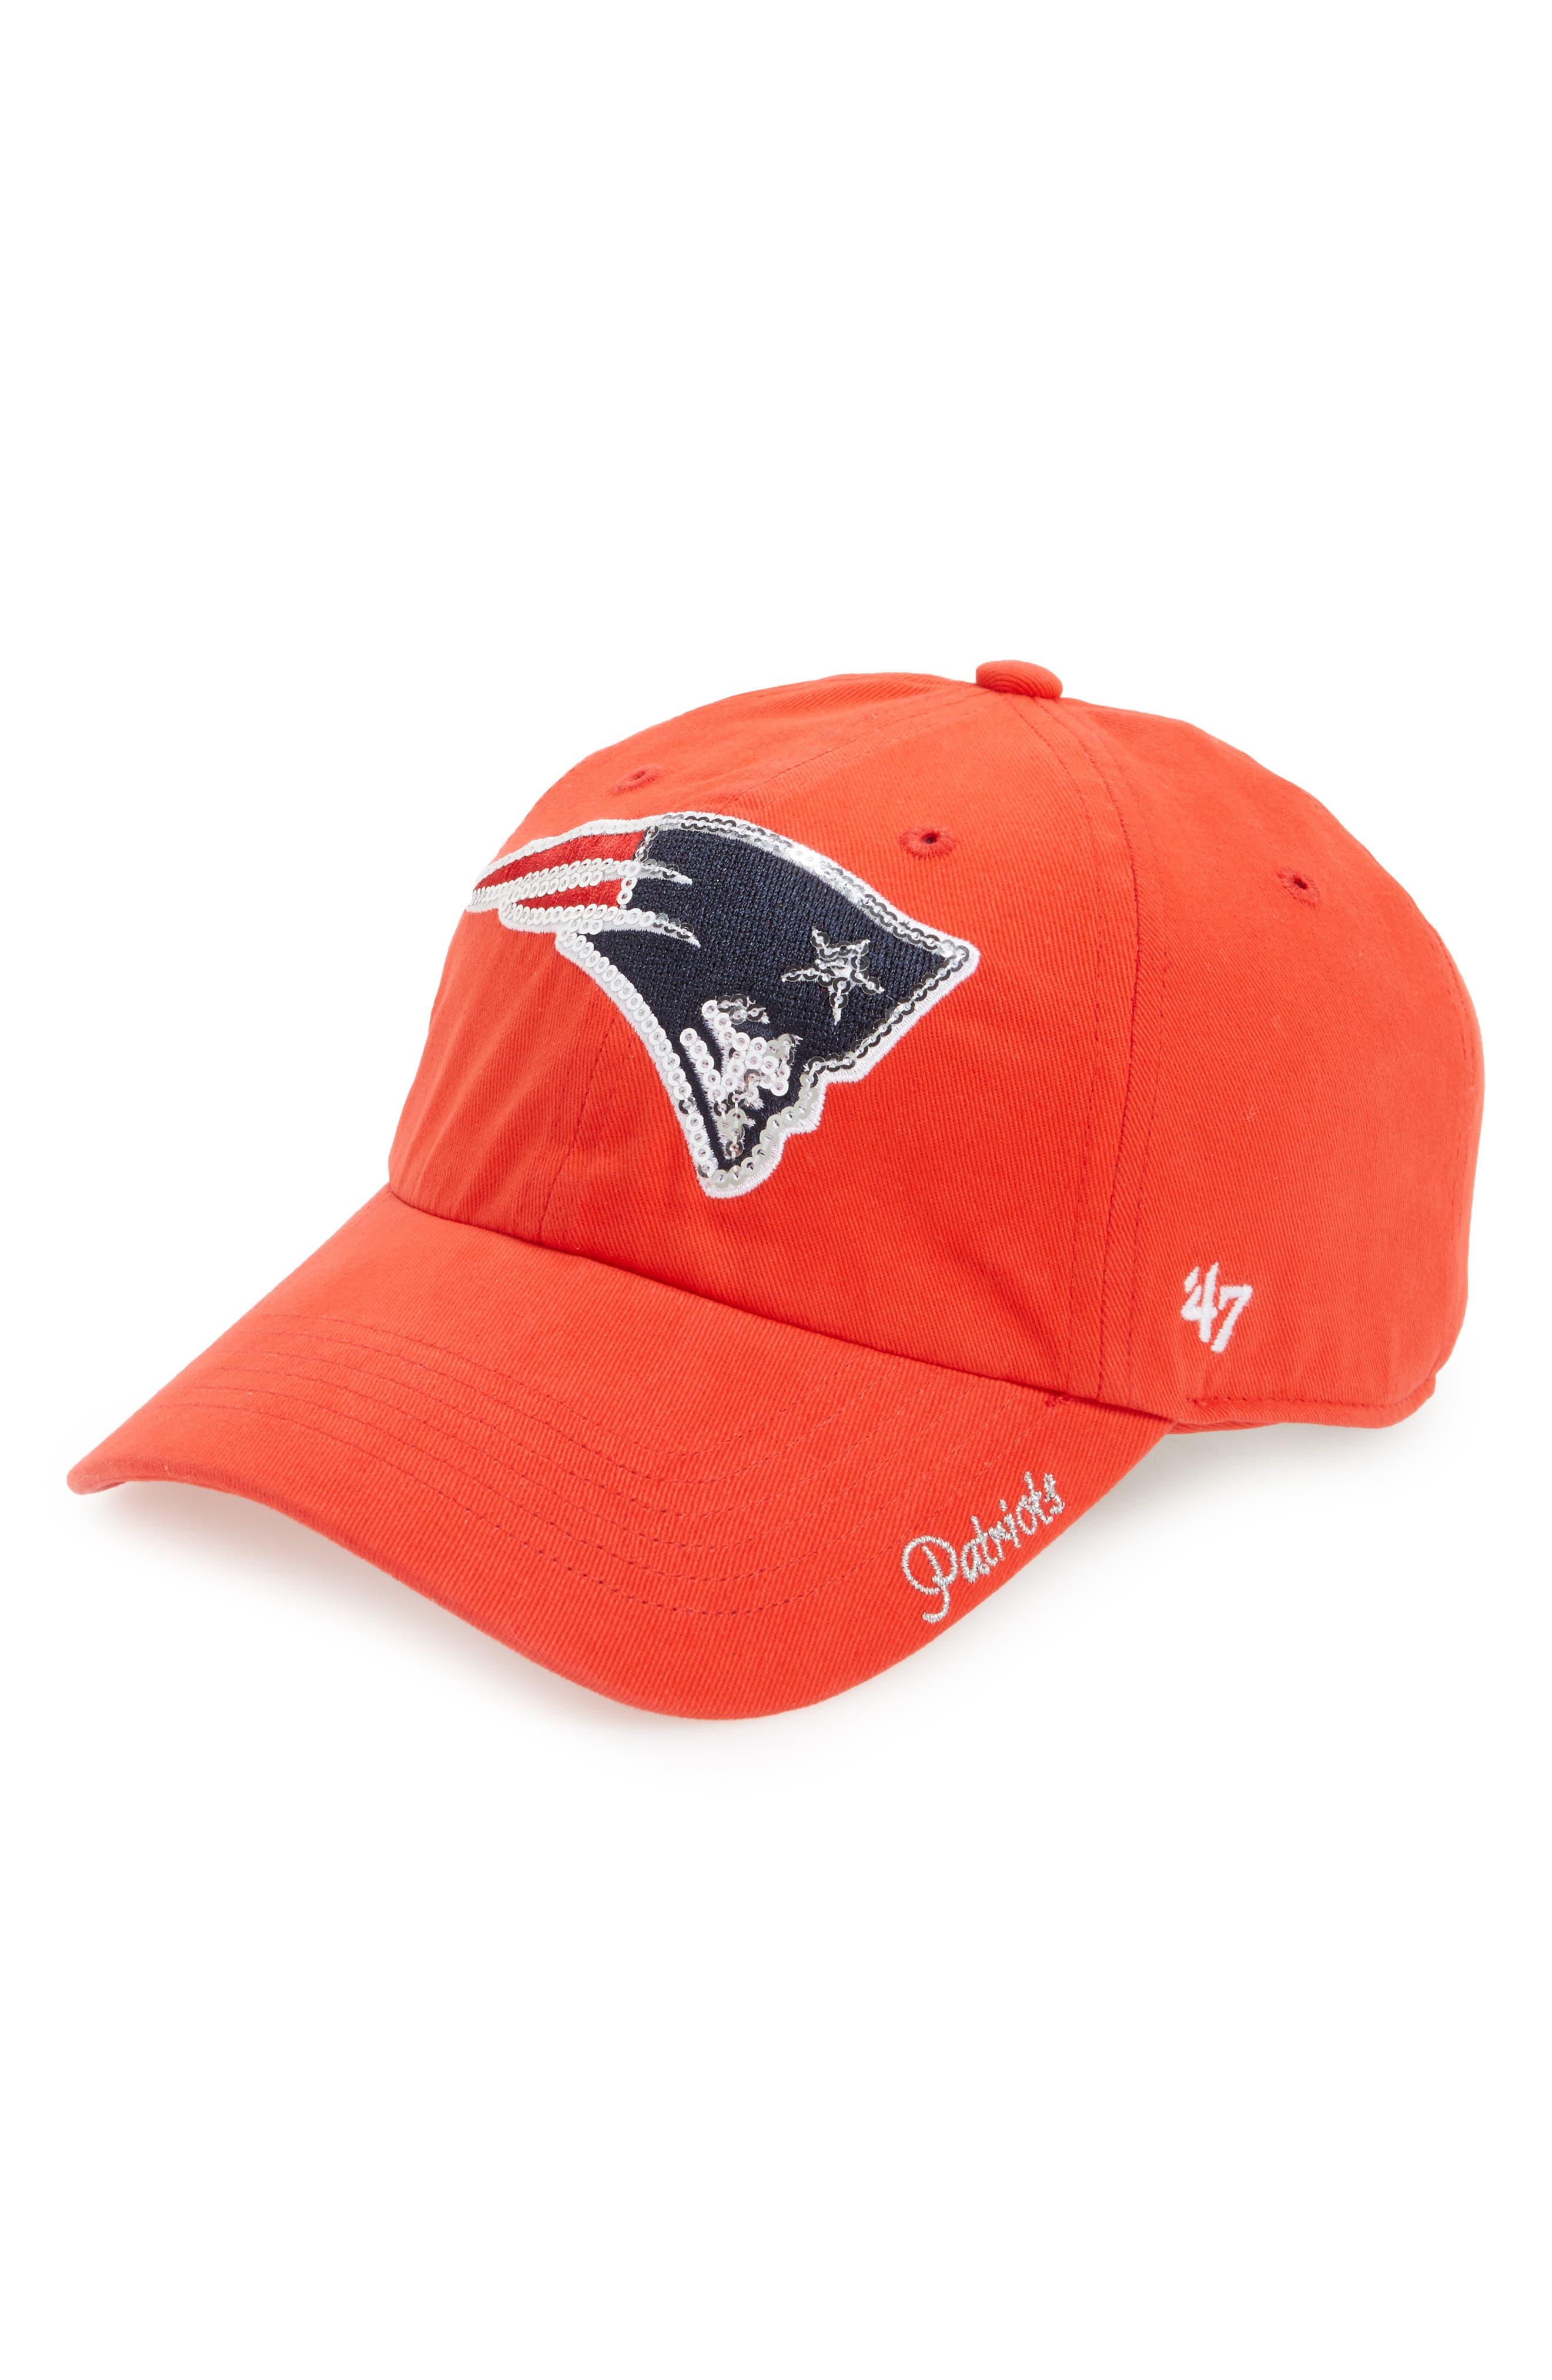 New England Patriots Sparkle Cap,                         Main,                         color, Red